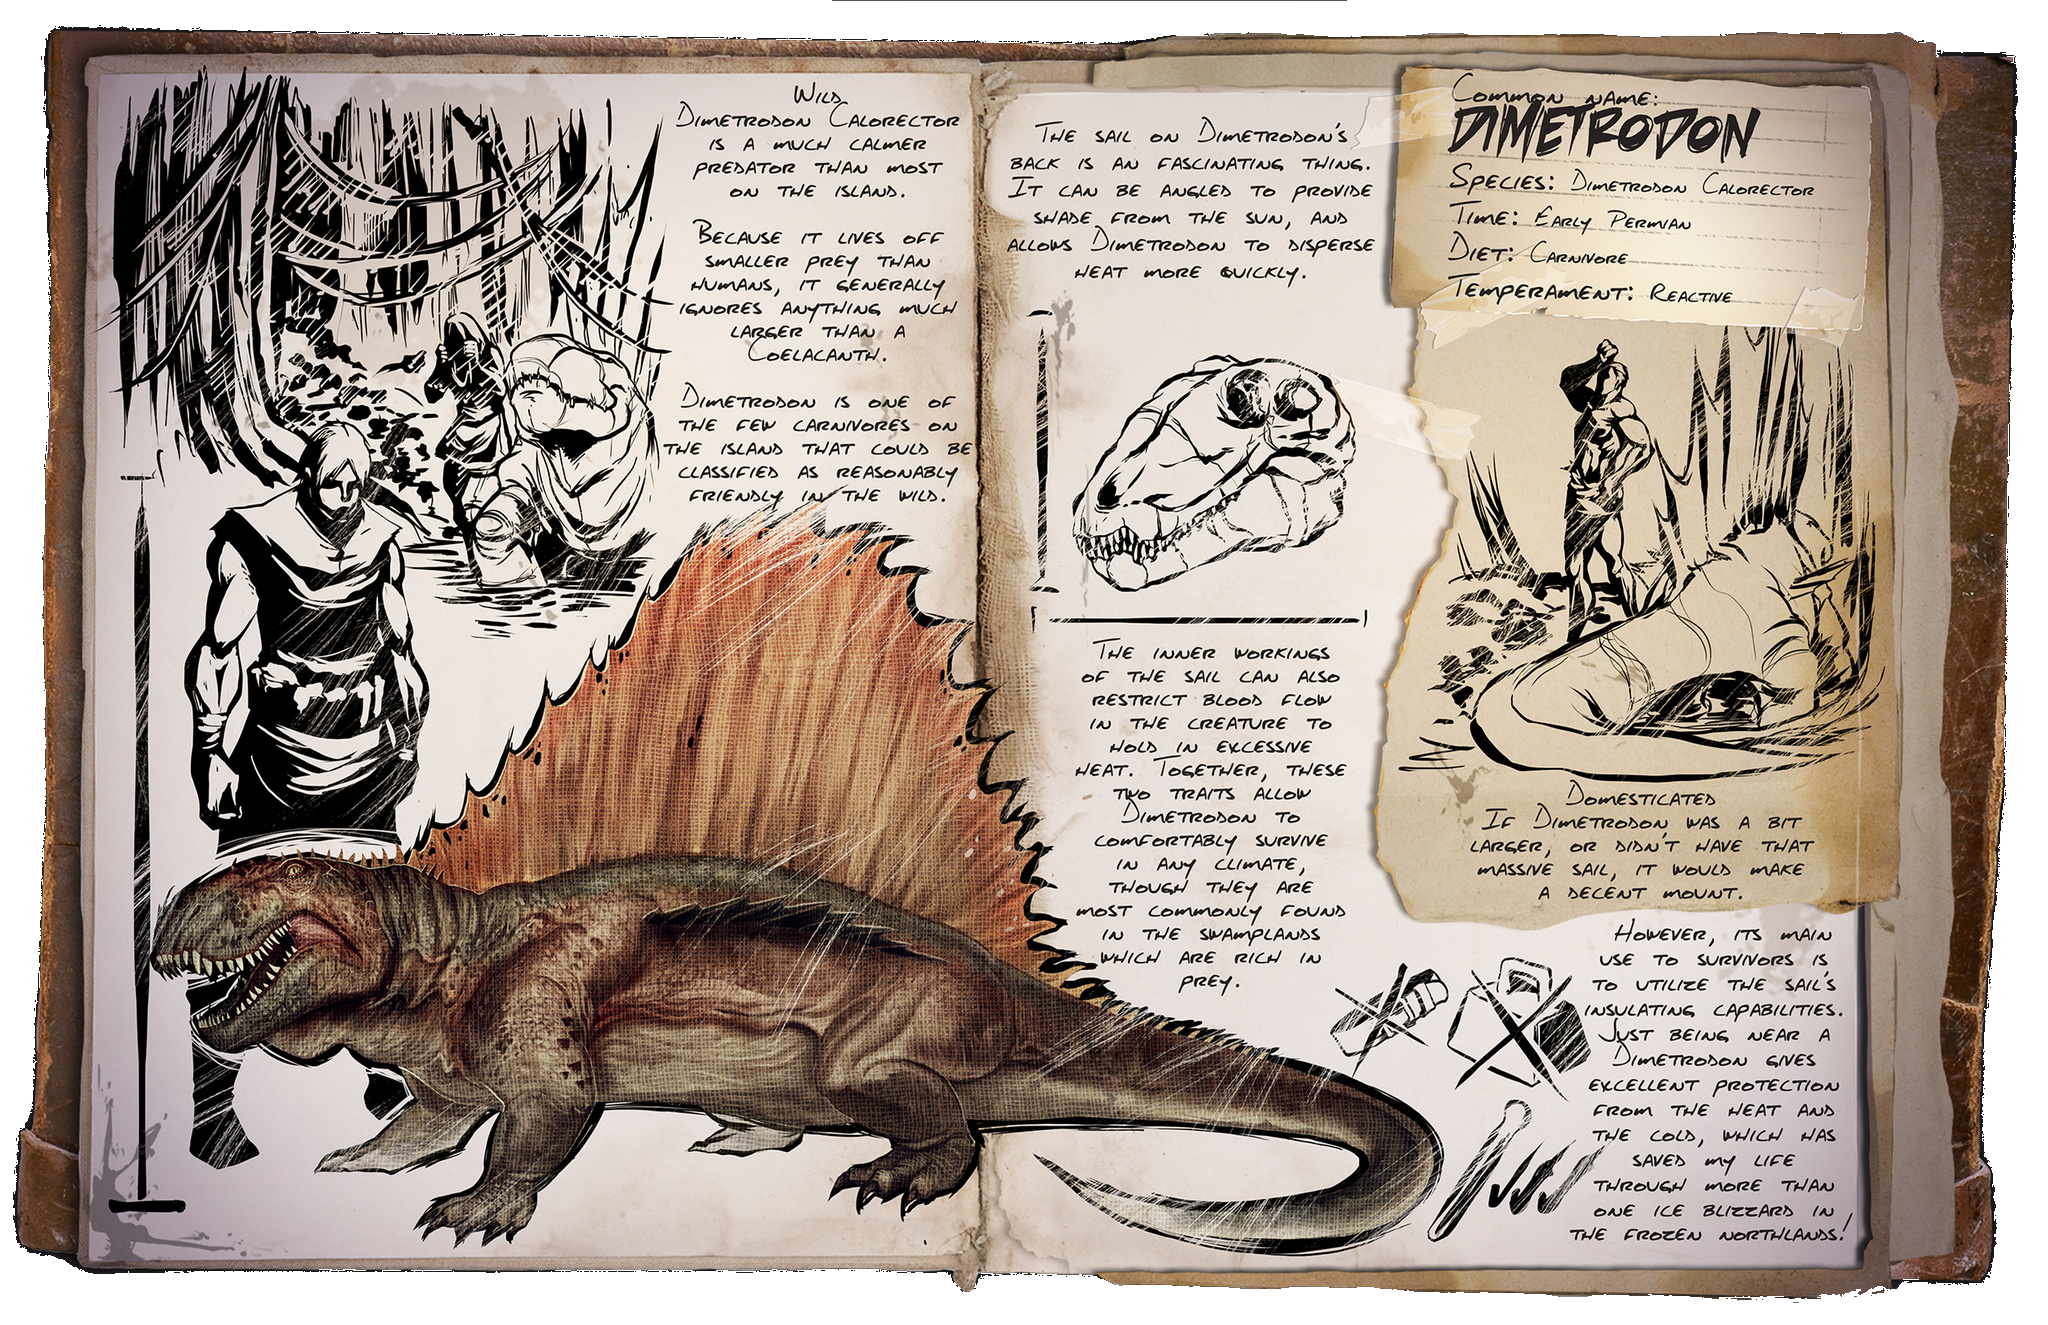 Dossier Dimetrodon Png Png Grafik 2048 1325 Pixel Ark Survival Evolved Game Ark Survival Evolved Creatures